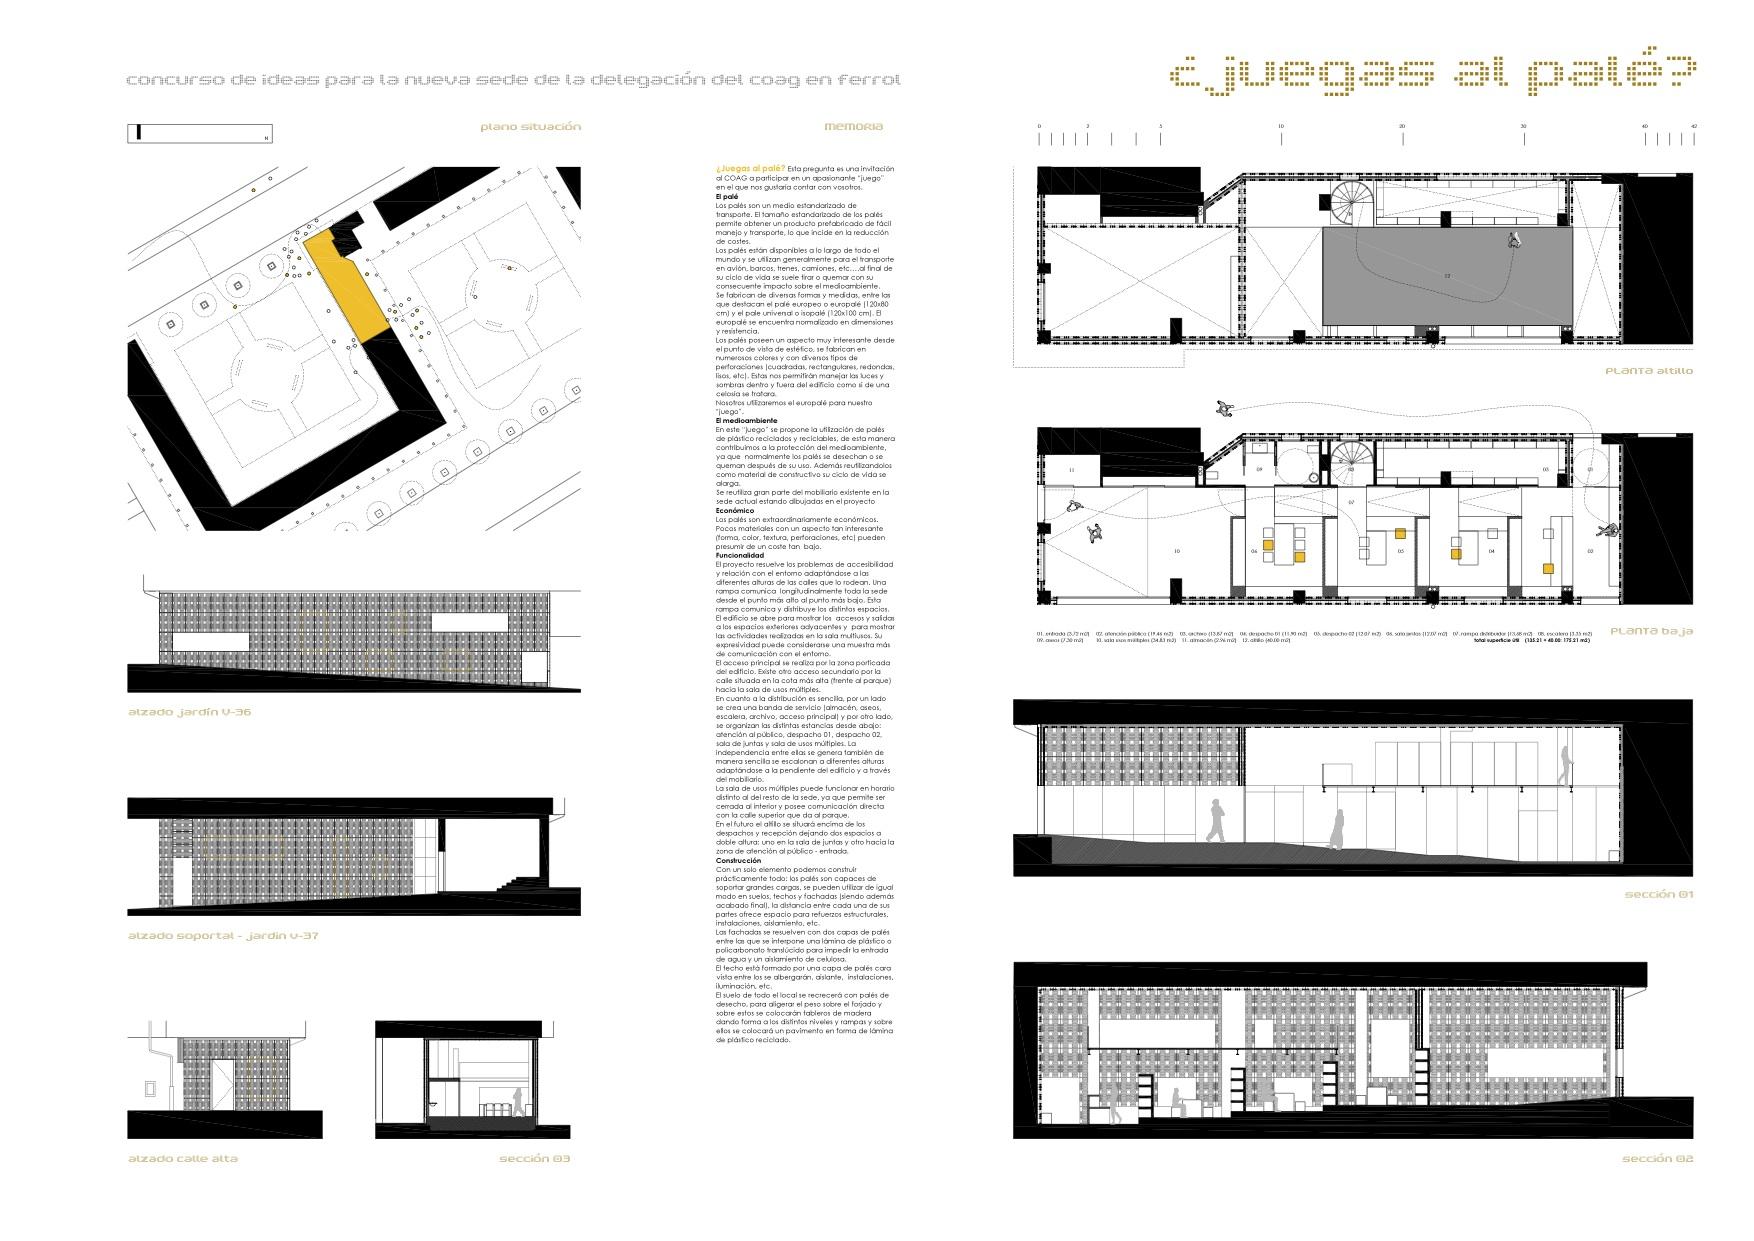 Delegaci n del coag ferrol 2es oficina de arquitectura - Arquitectos ferrol ...